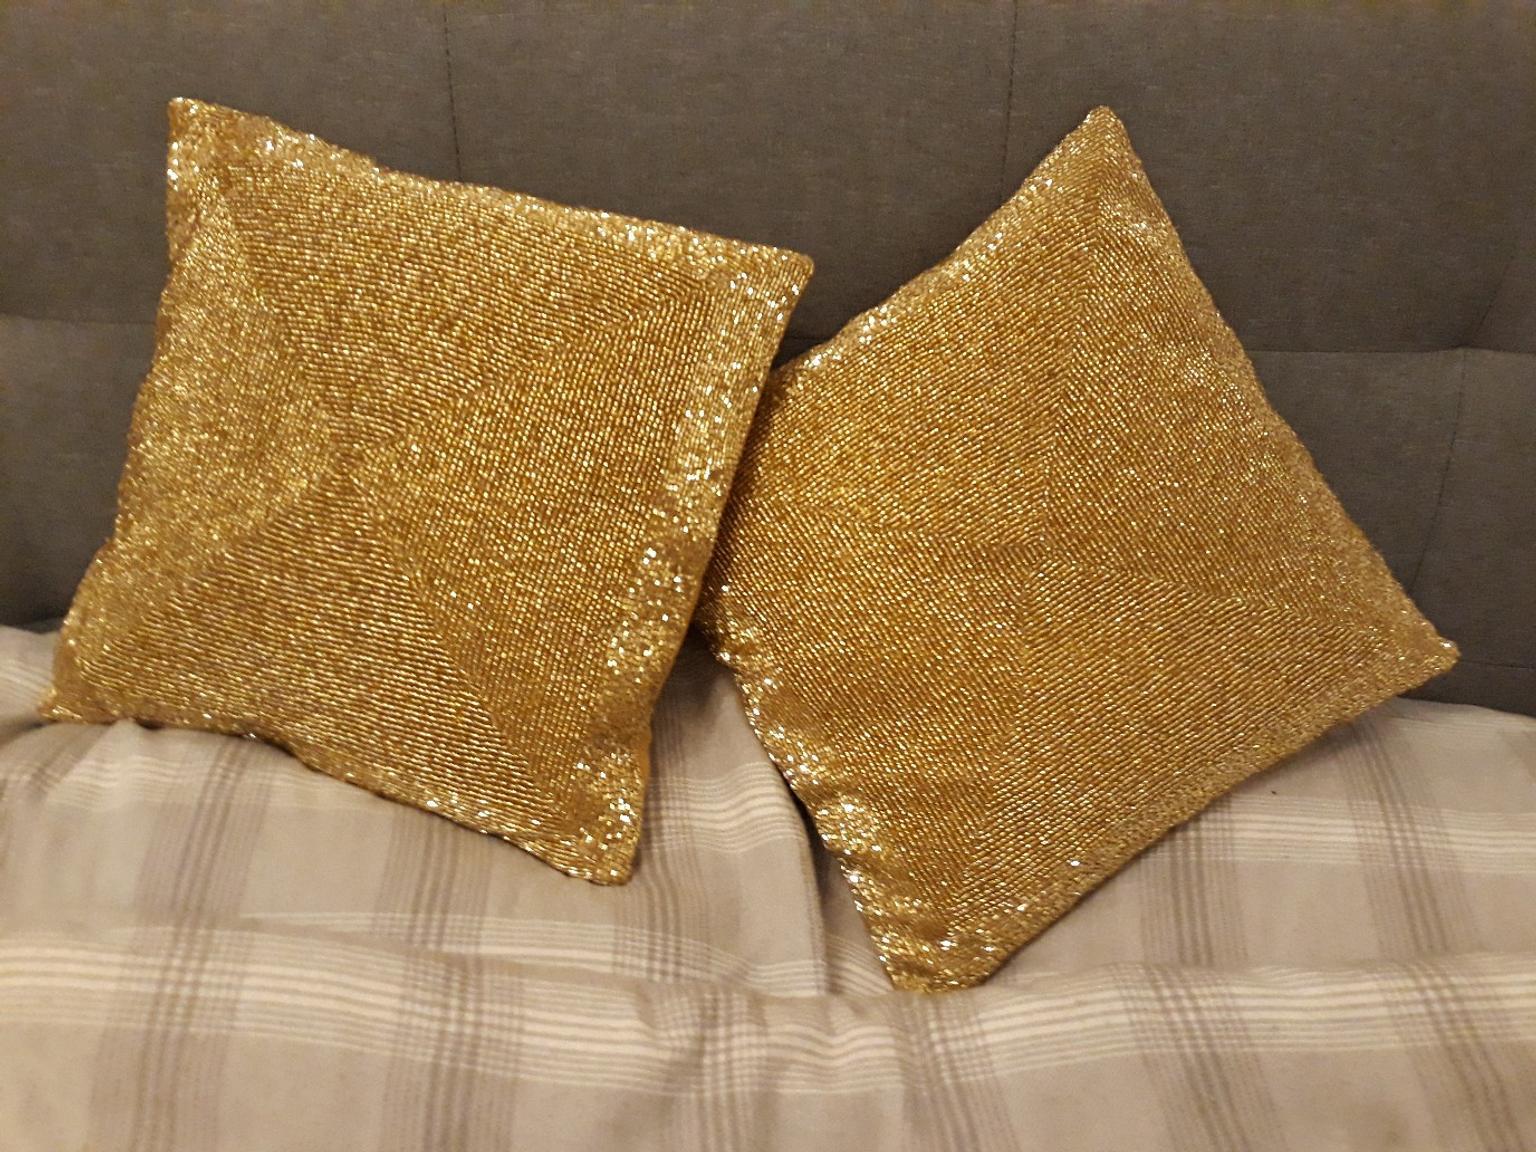 laura ashley gold beaded cushions